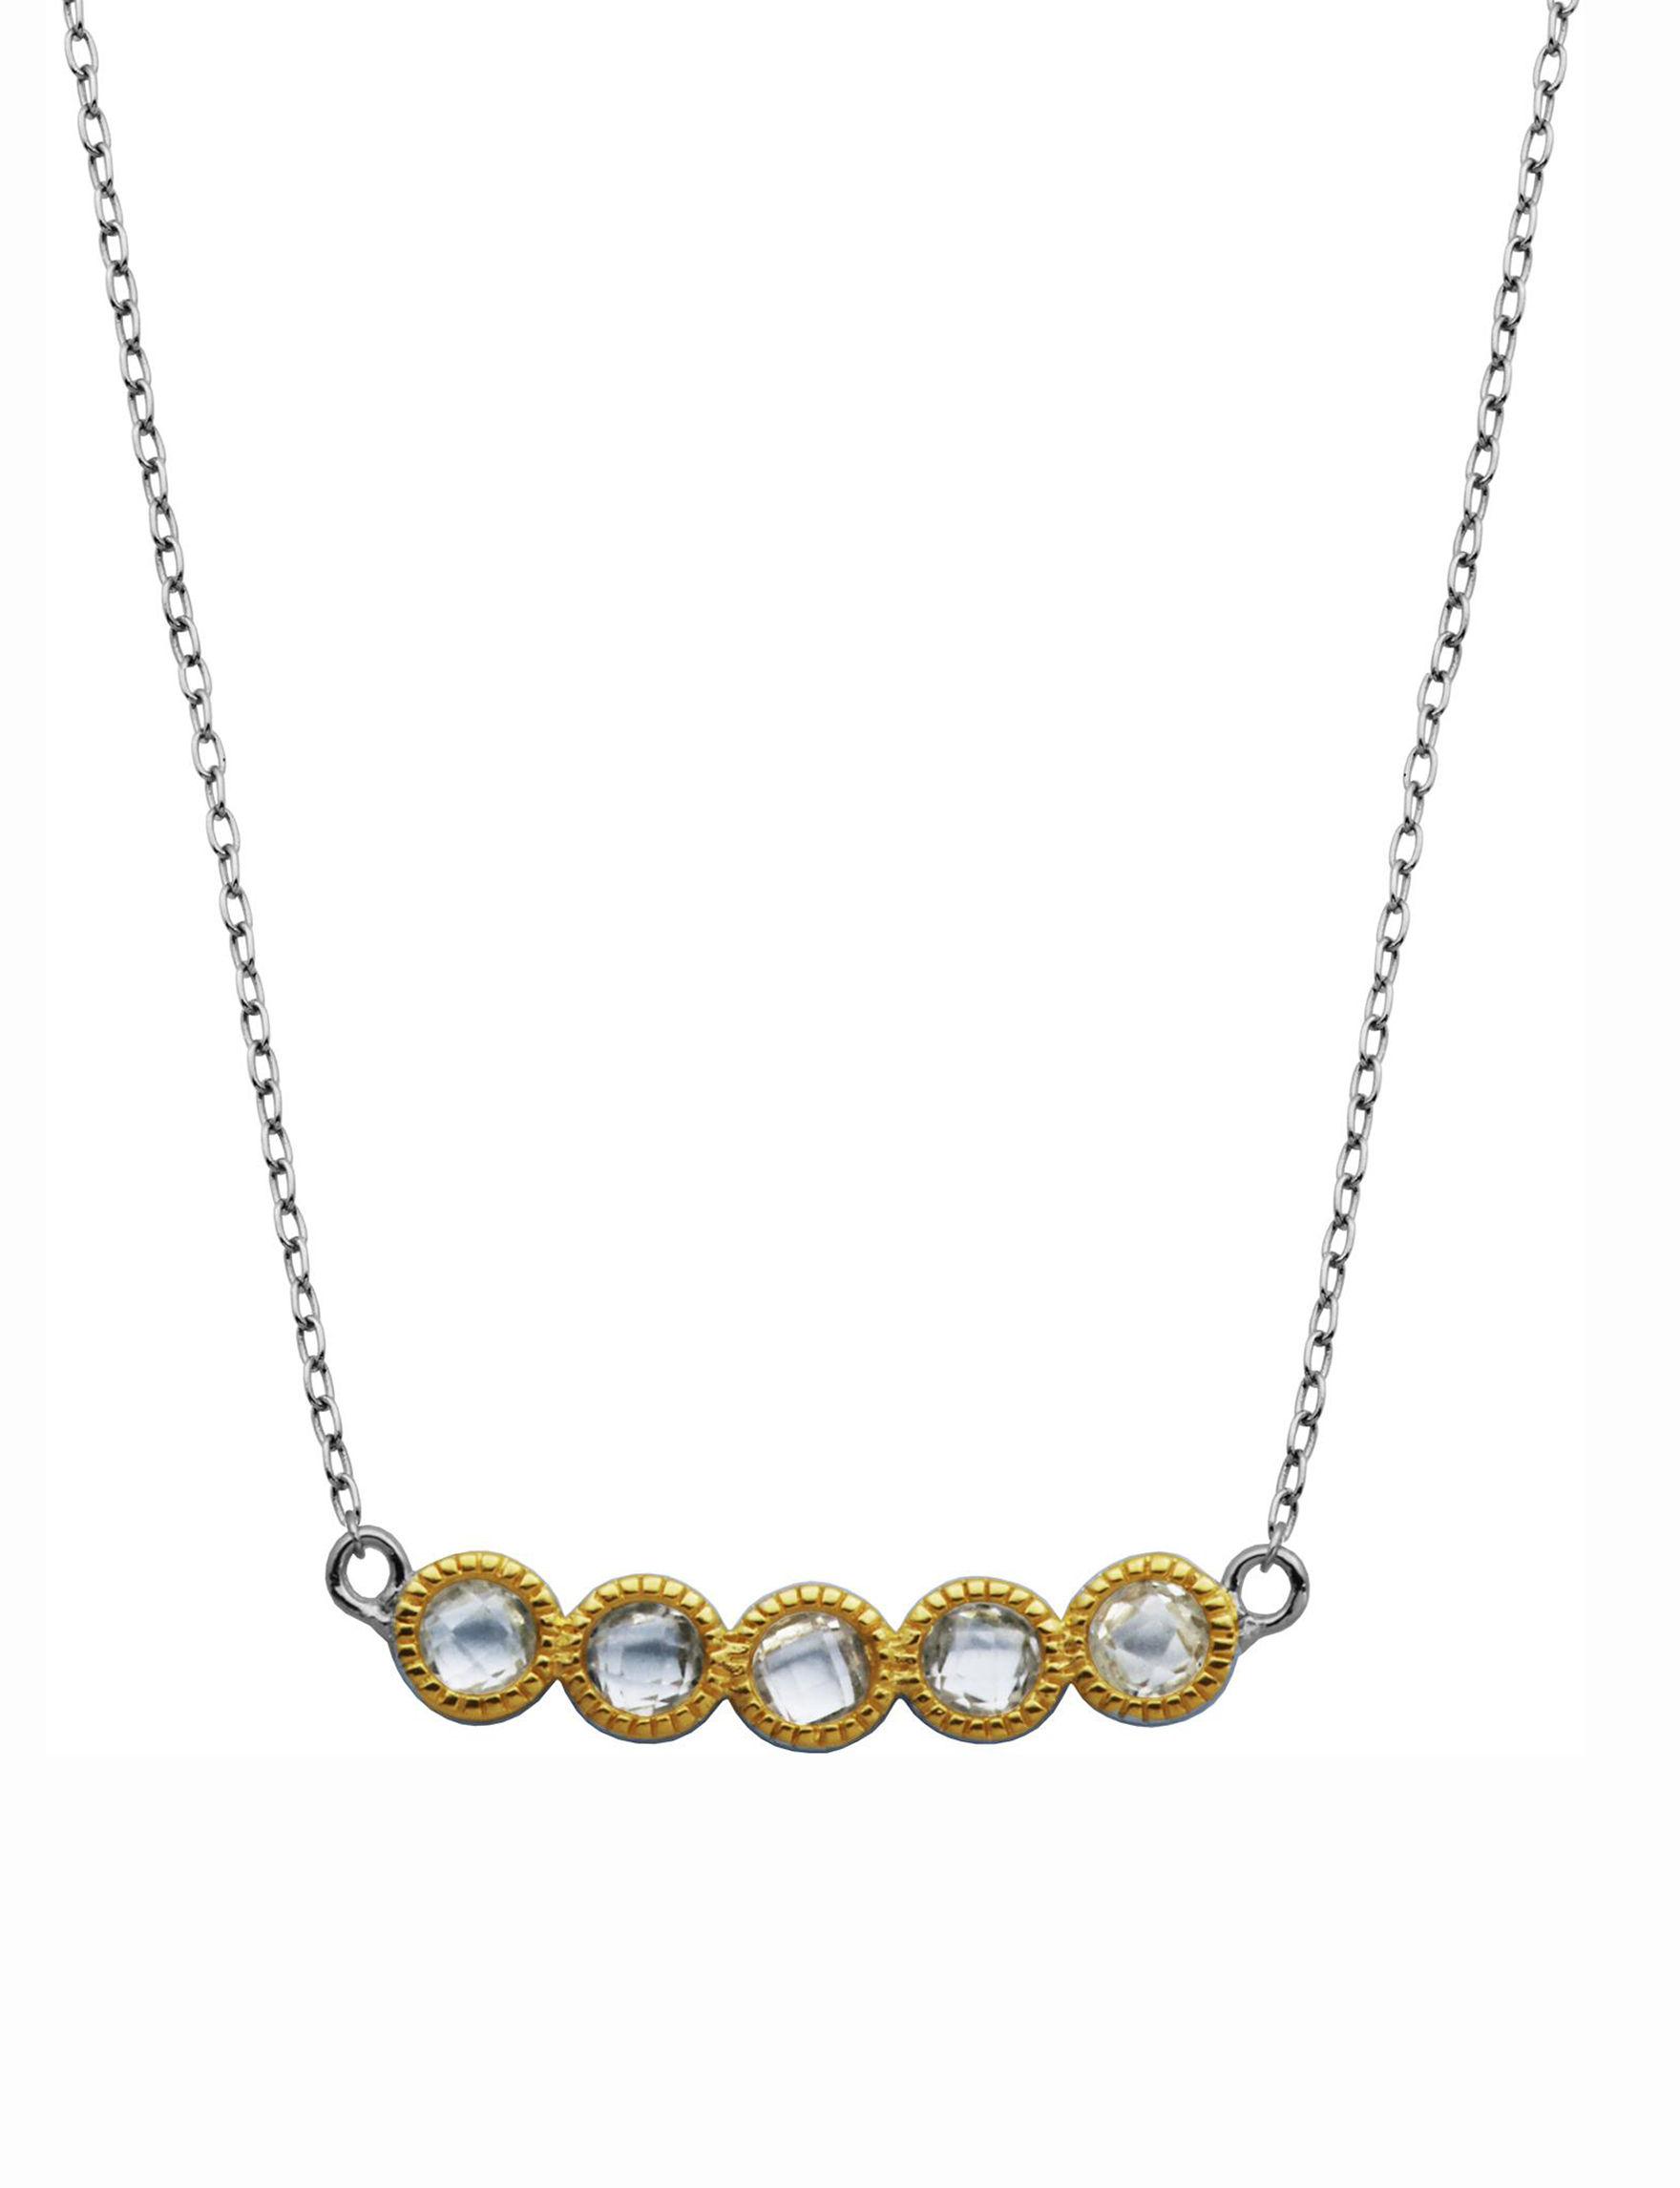 PAJ INC. Silver / Gold Necklaces & Pendants Fine Jewelry